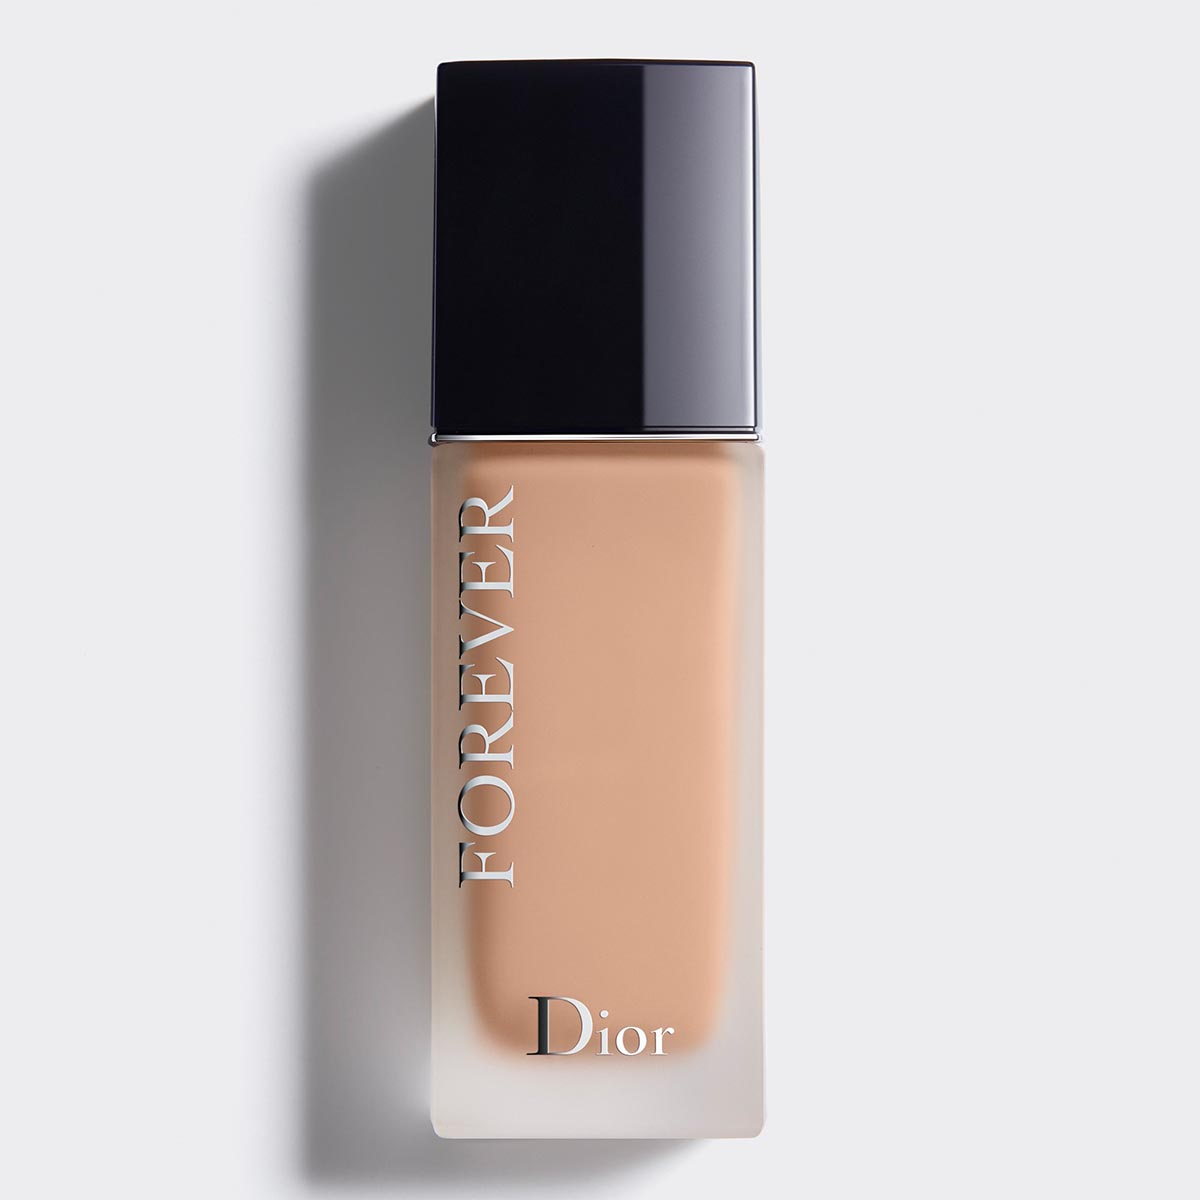 Dior diorskin forever matte base 3cr cool rosy